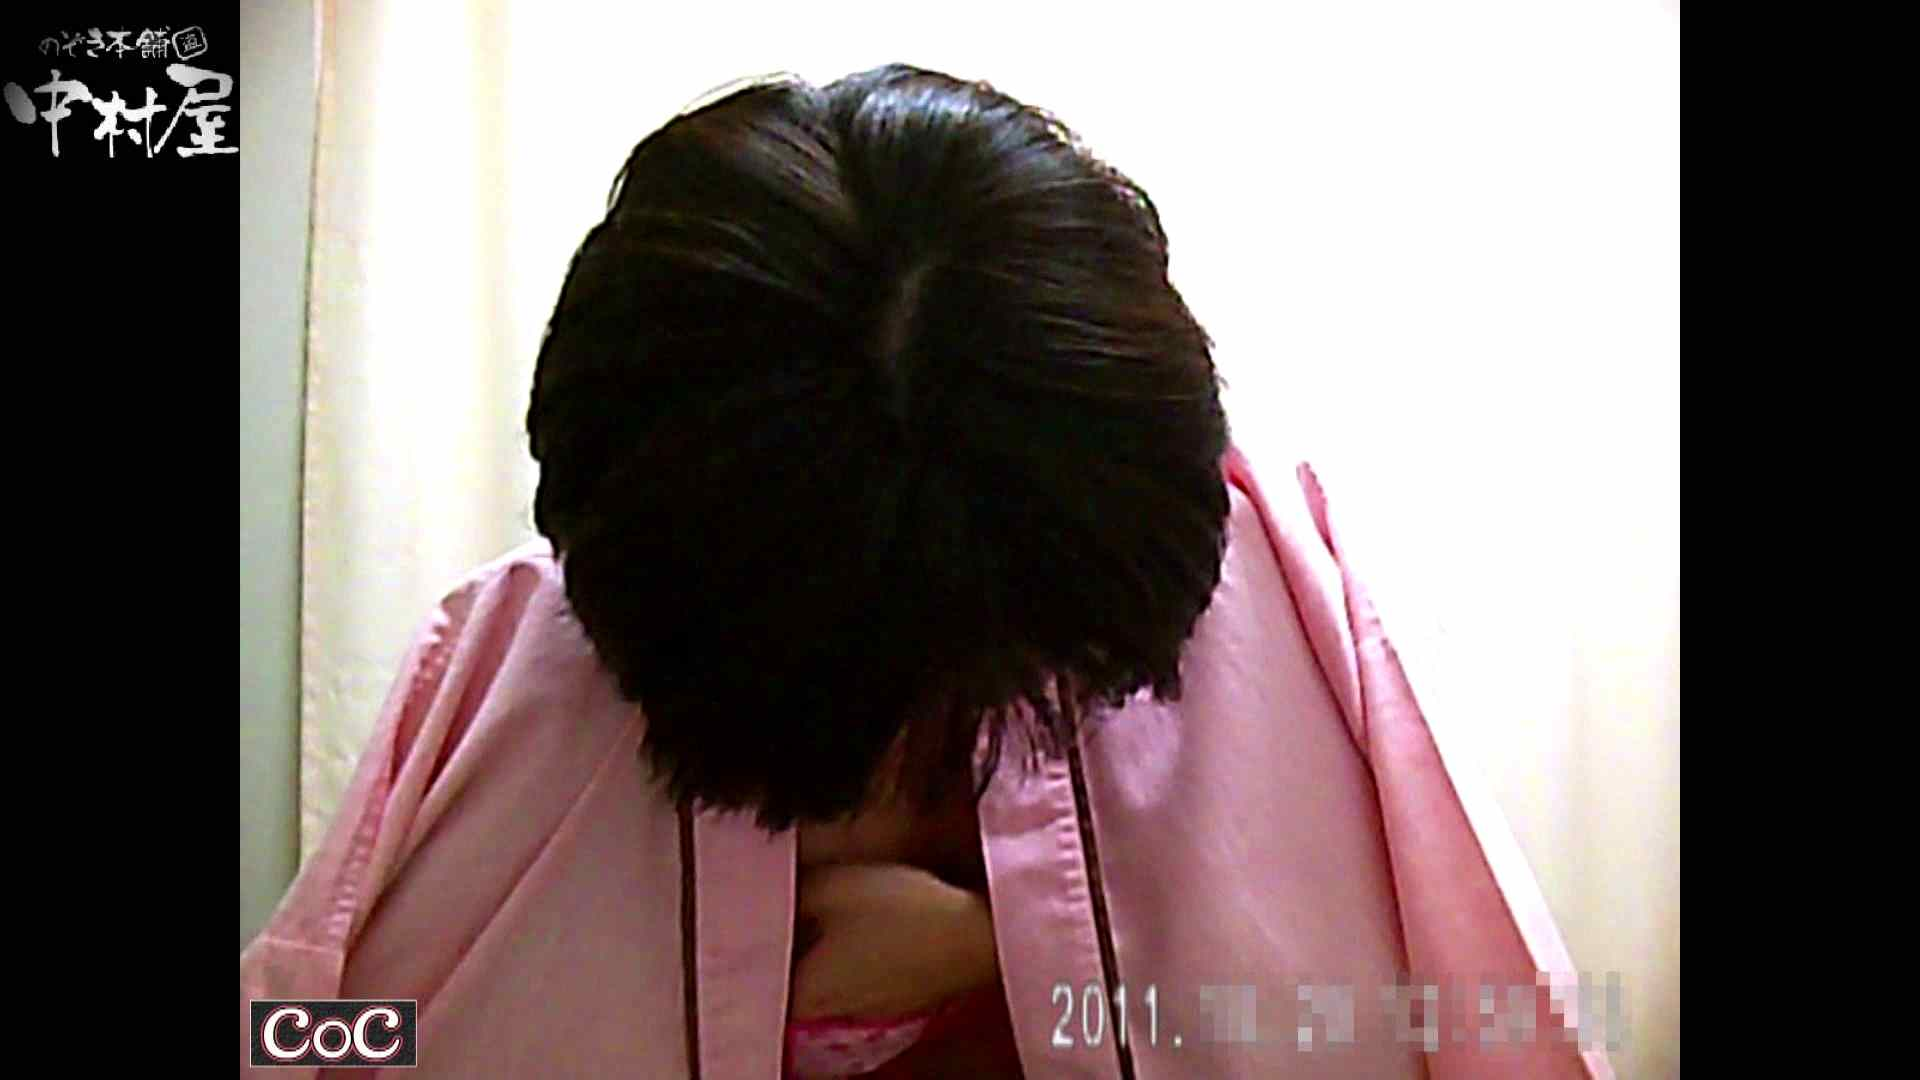 Doctor-X元医者による反抗vol.65 おまんこ見放題 | 盗撮シリーズ  102PIX 55